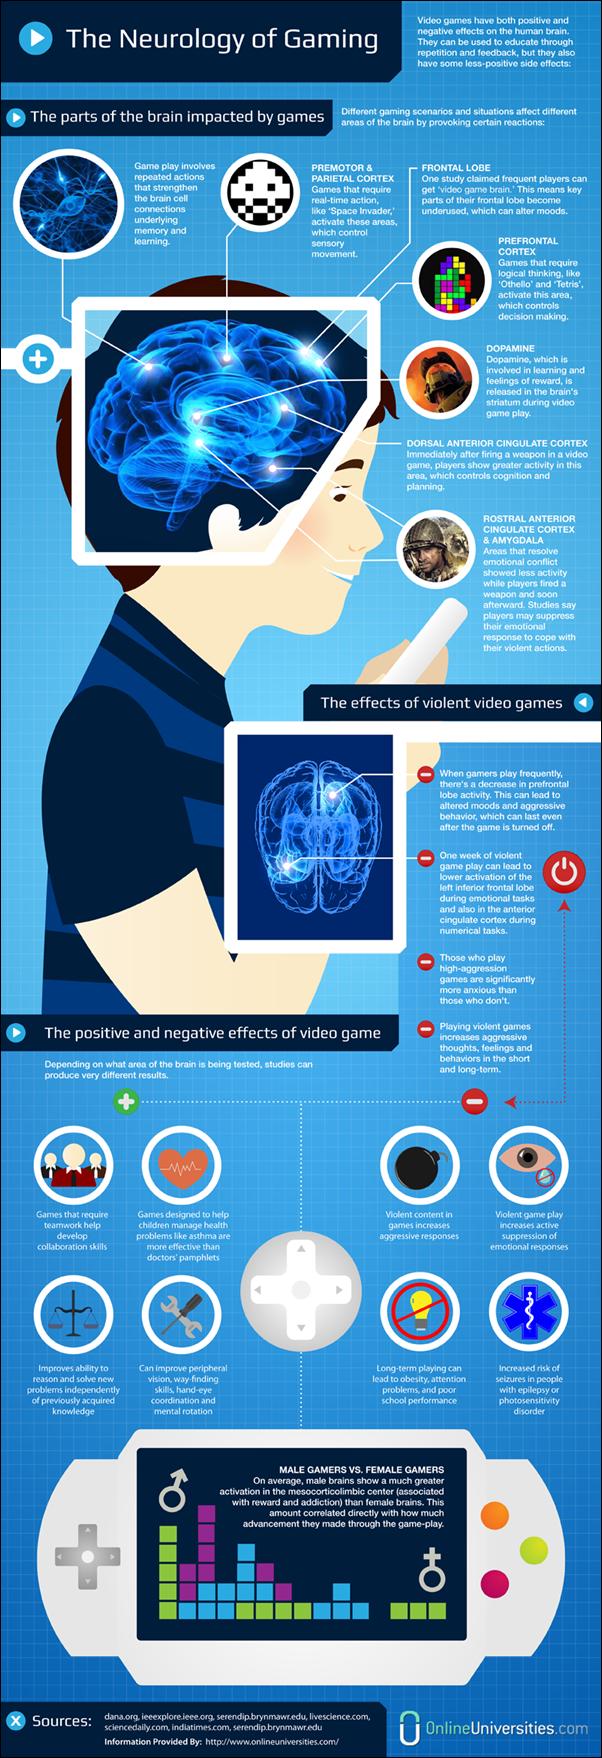 TheNeurologyofGaming-infographic